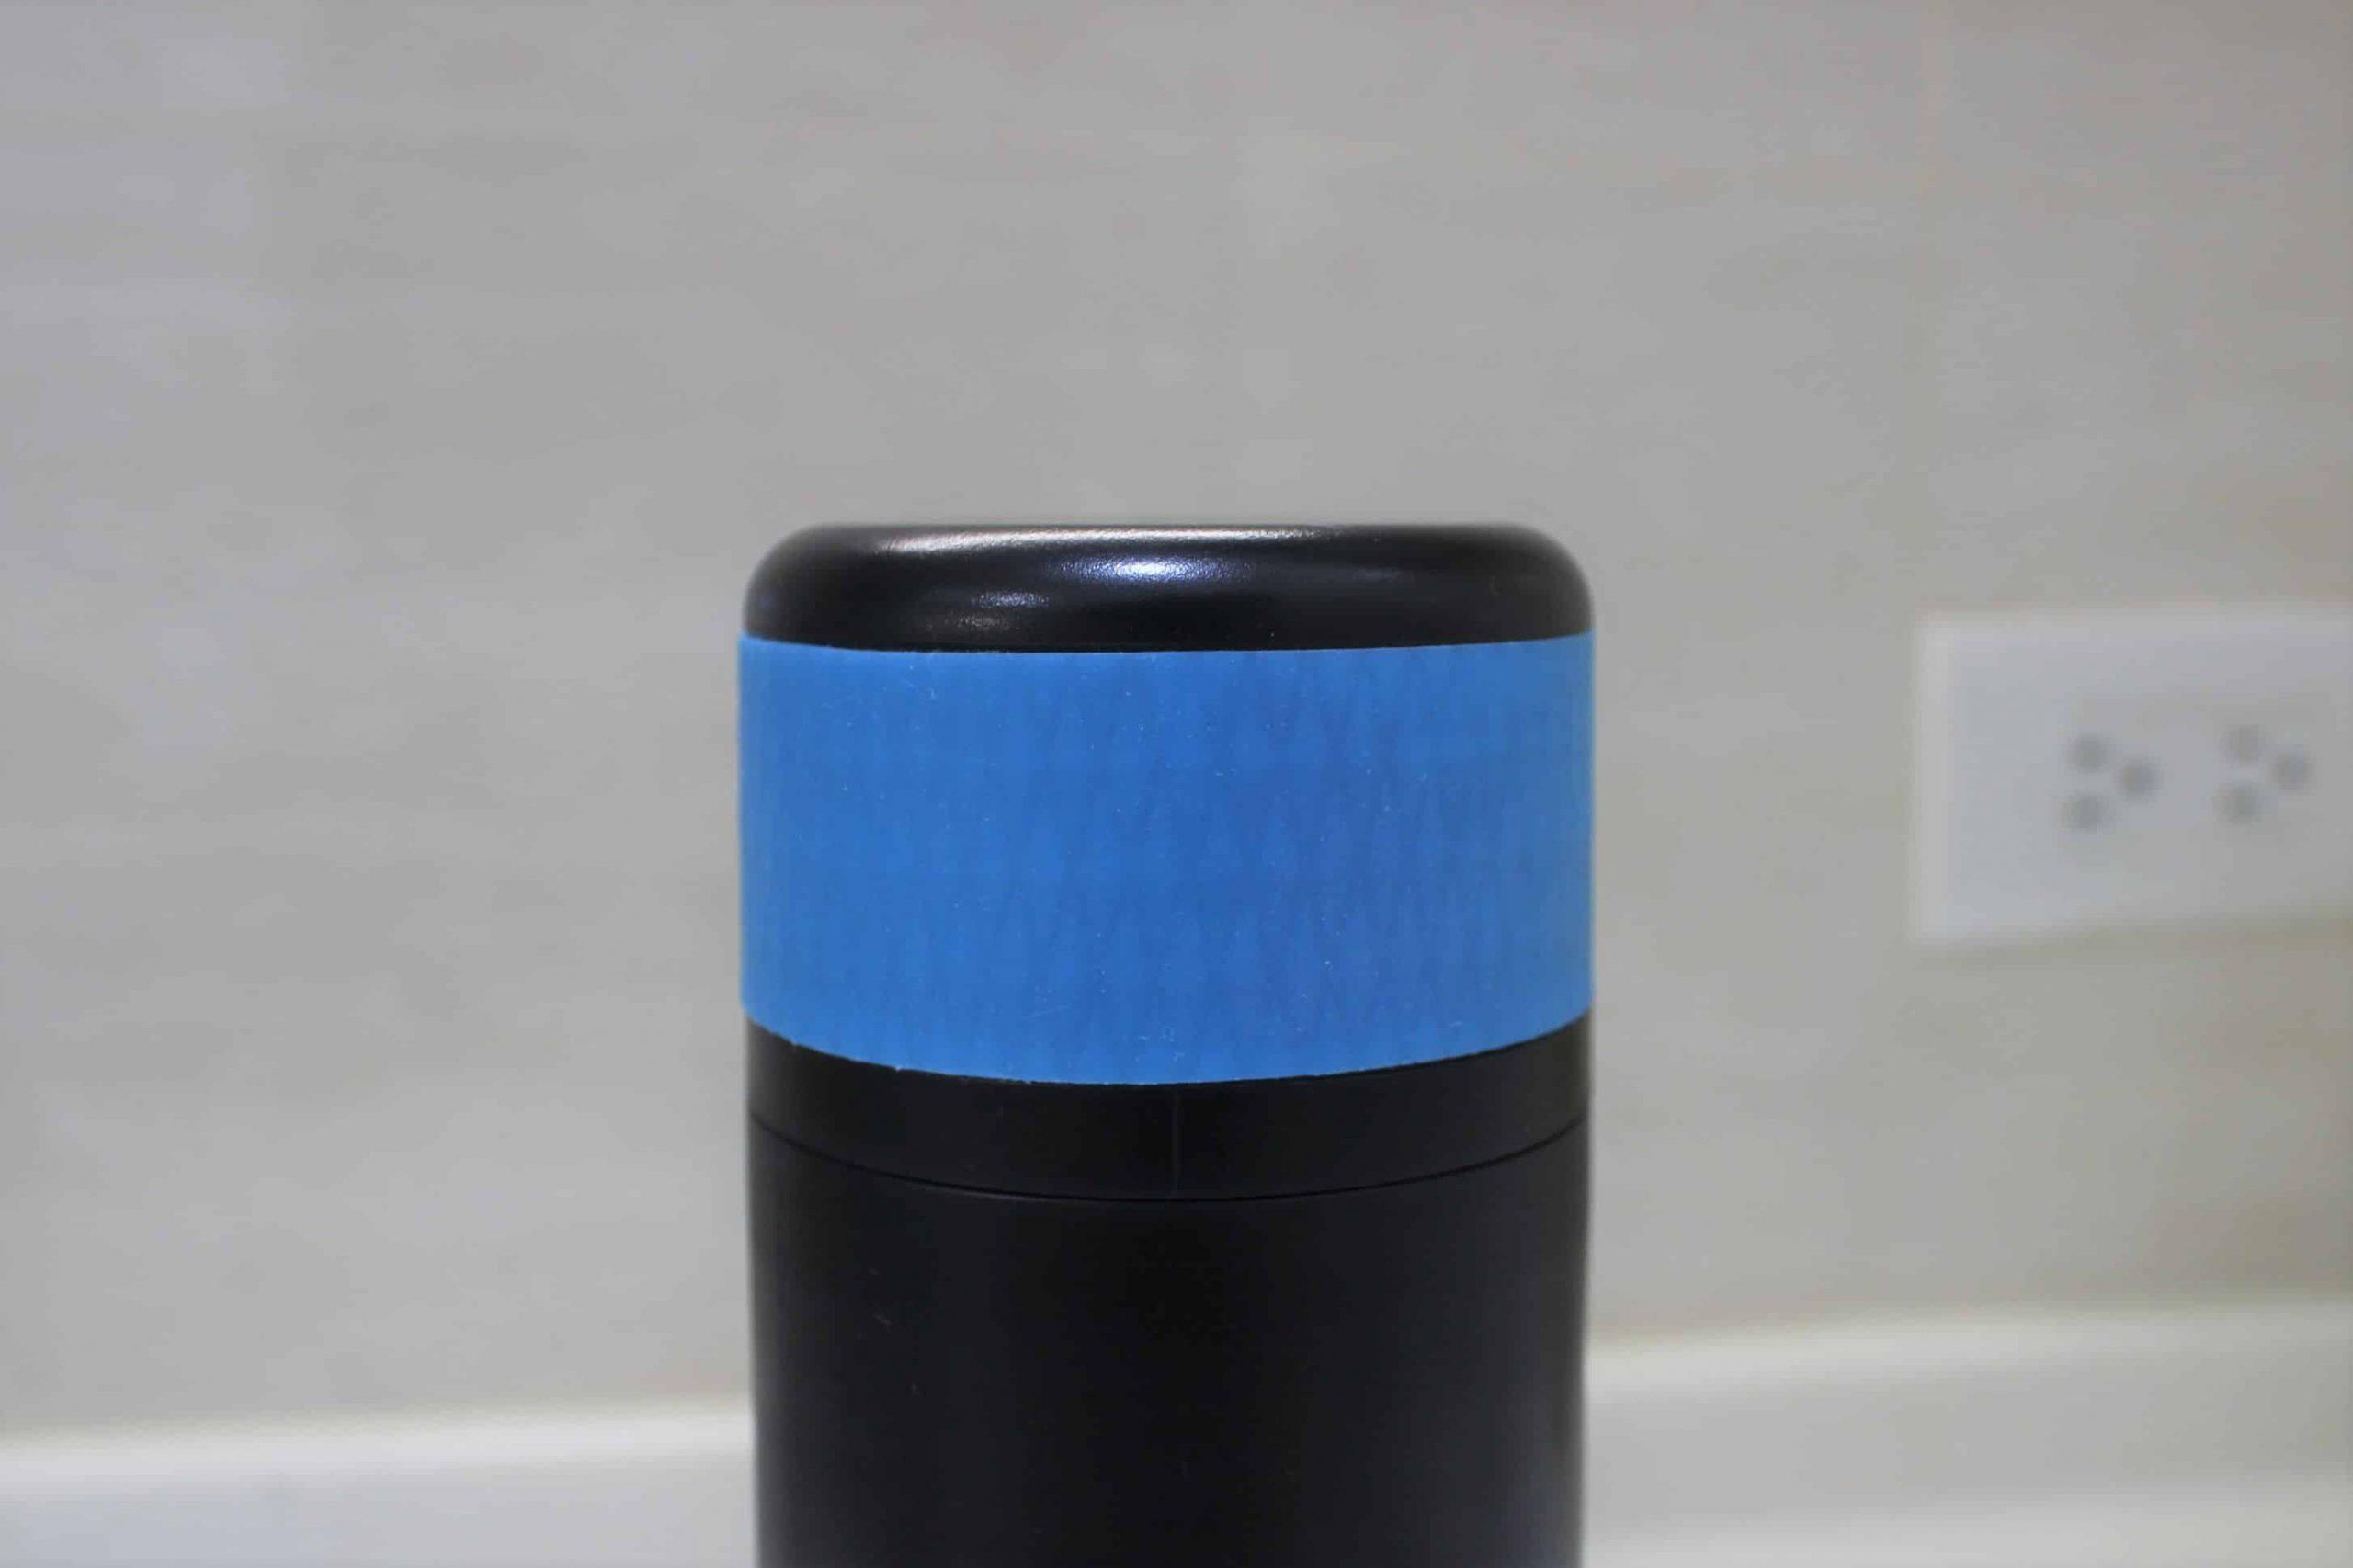 Indiegogo上線!便攜式手壓濃縮咖啡機的勁敵 - WinkGo電動濃縮咖啡機-TechTeller (科技說)